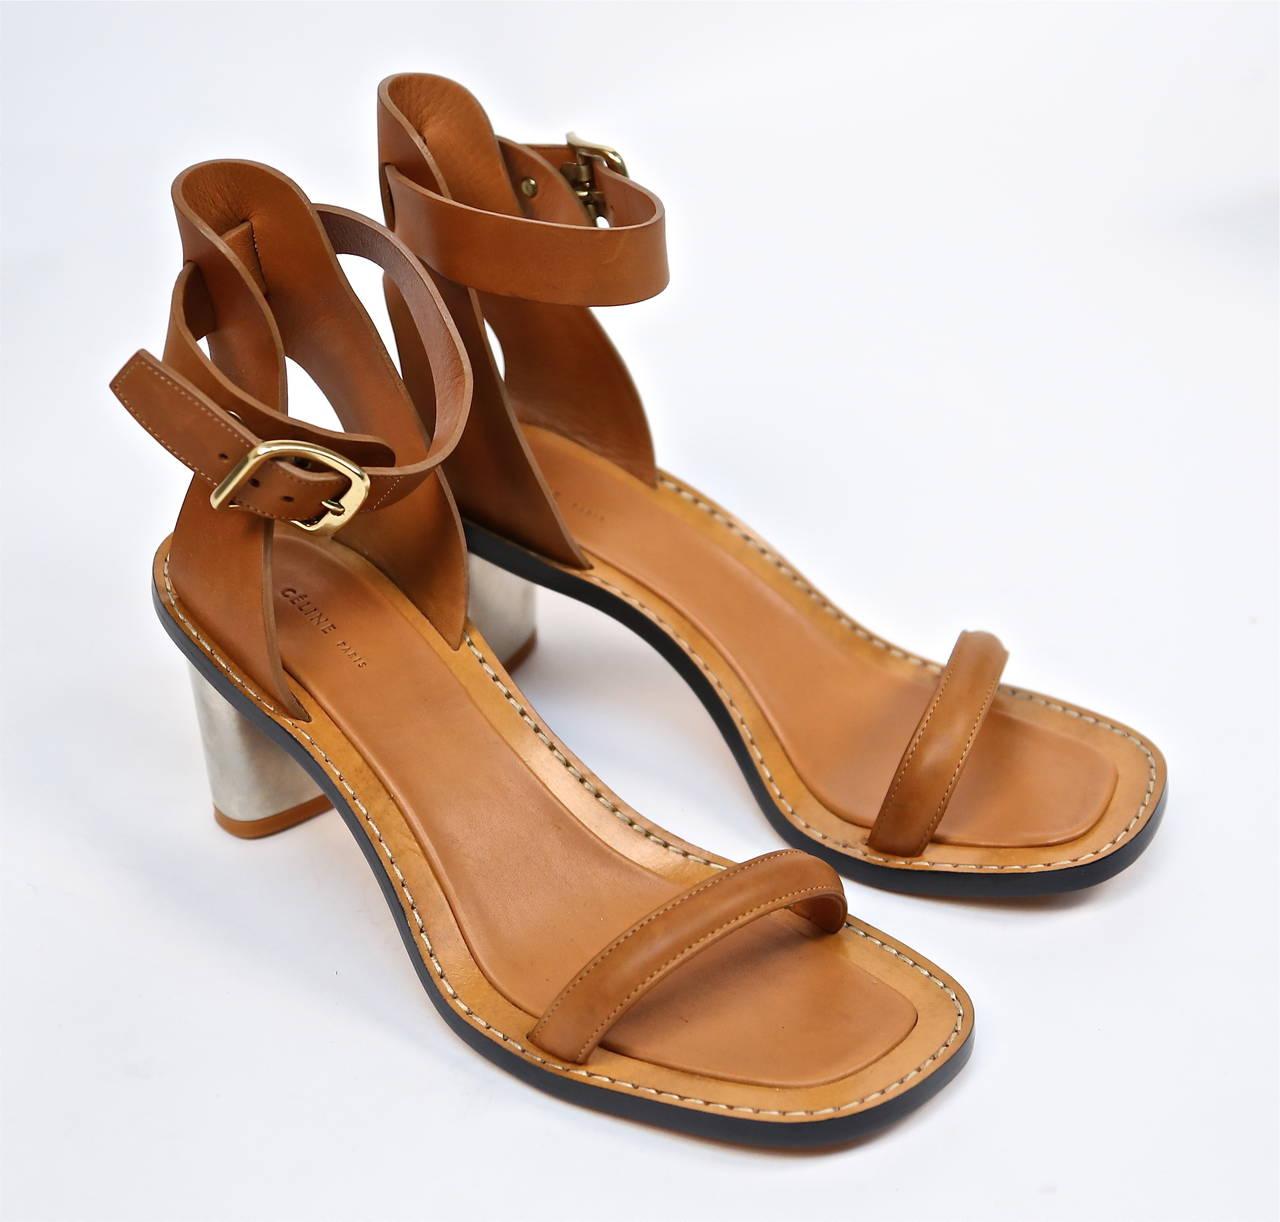 Céline Leather Sandal VjWNOol